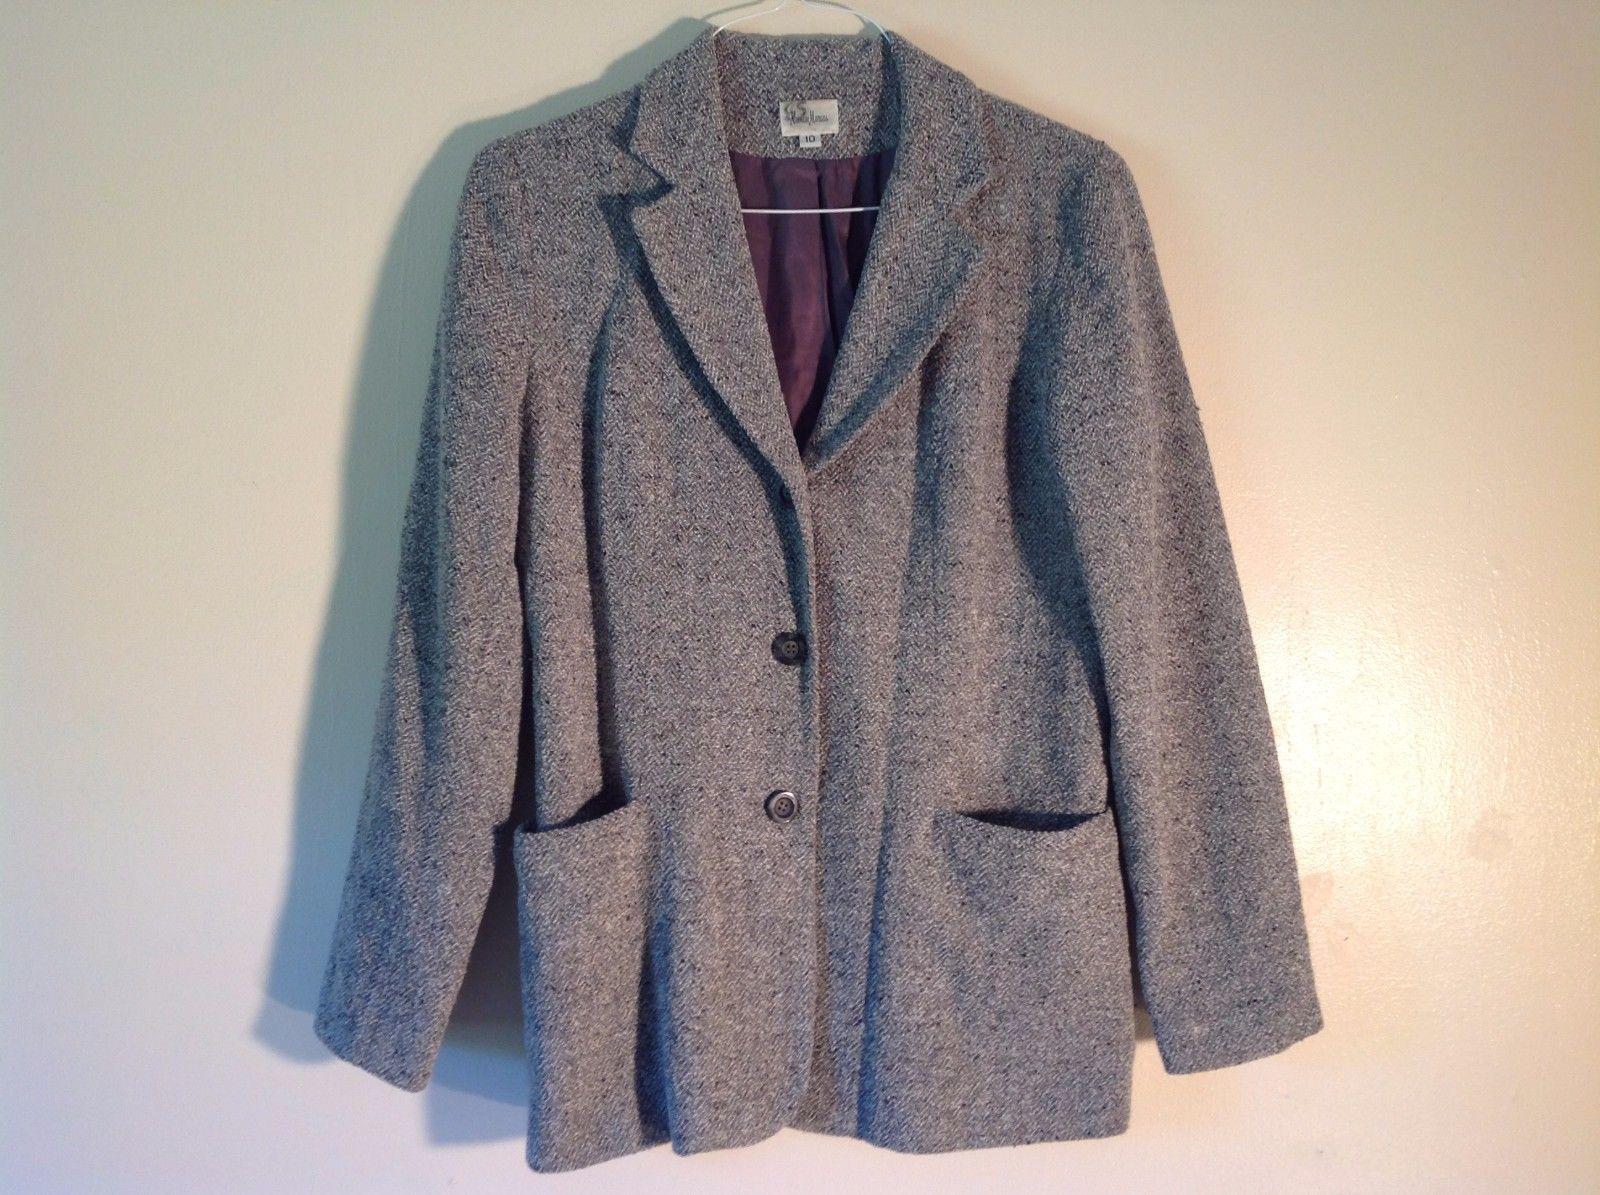 Good Condition Neiman Marcus Size 10 Gray Vintage Outerwear Jacket Chevron